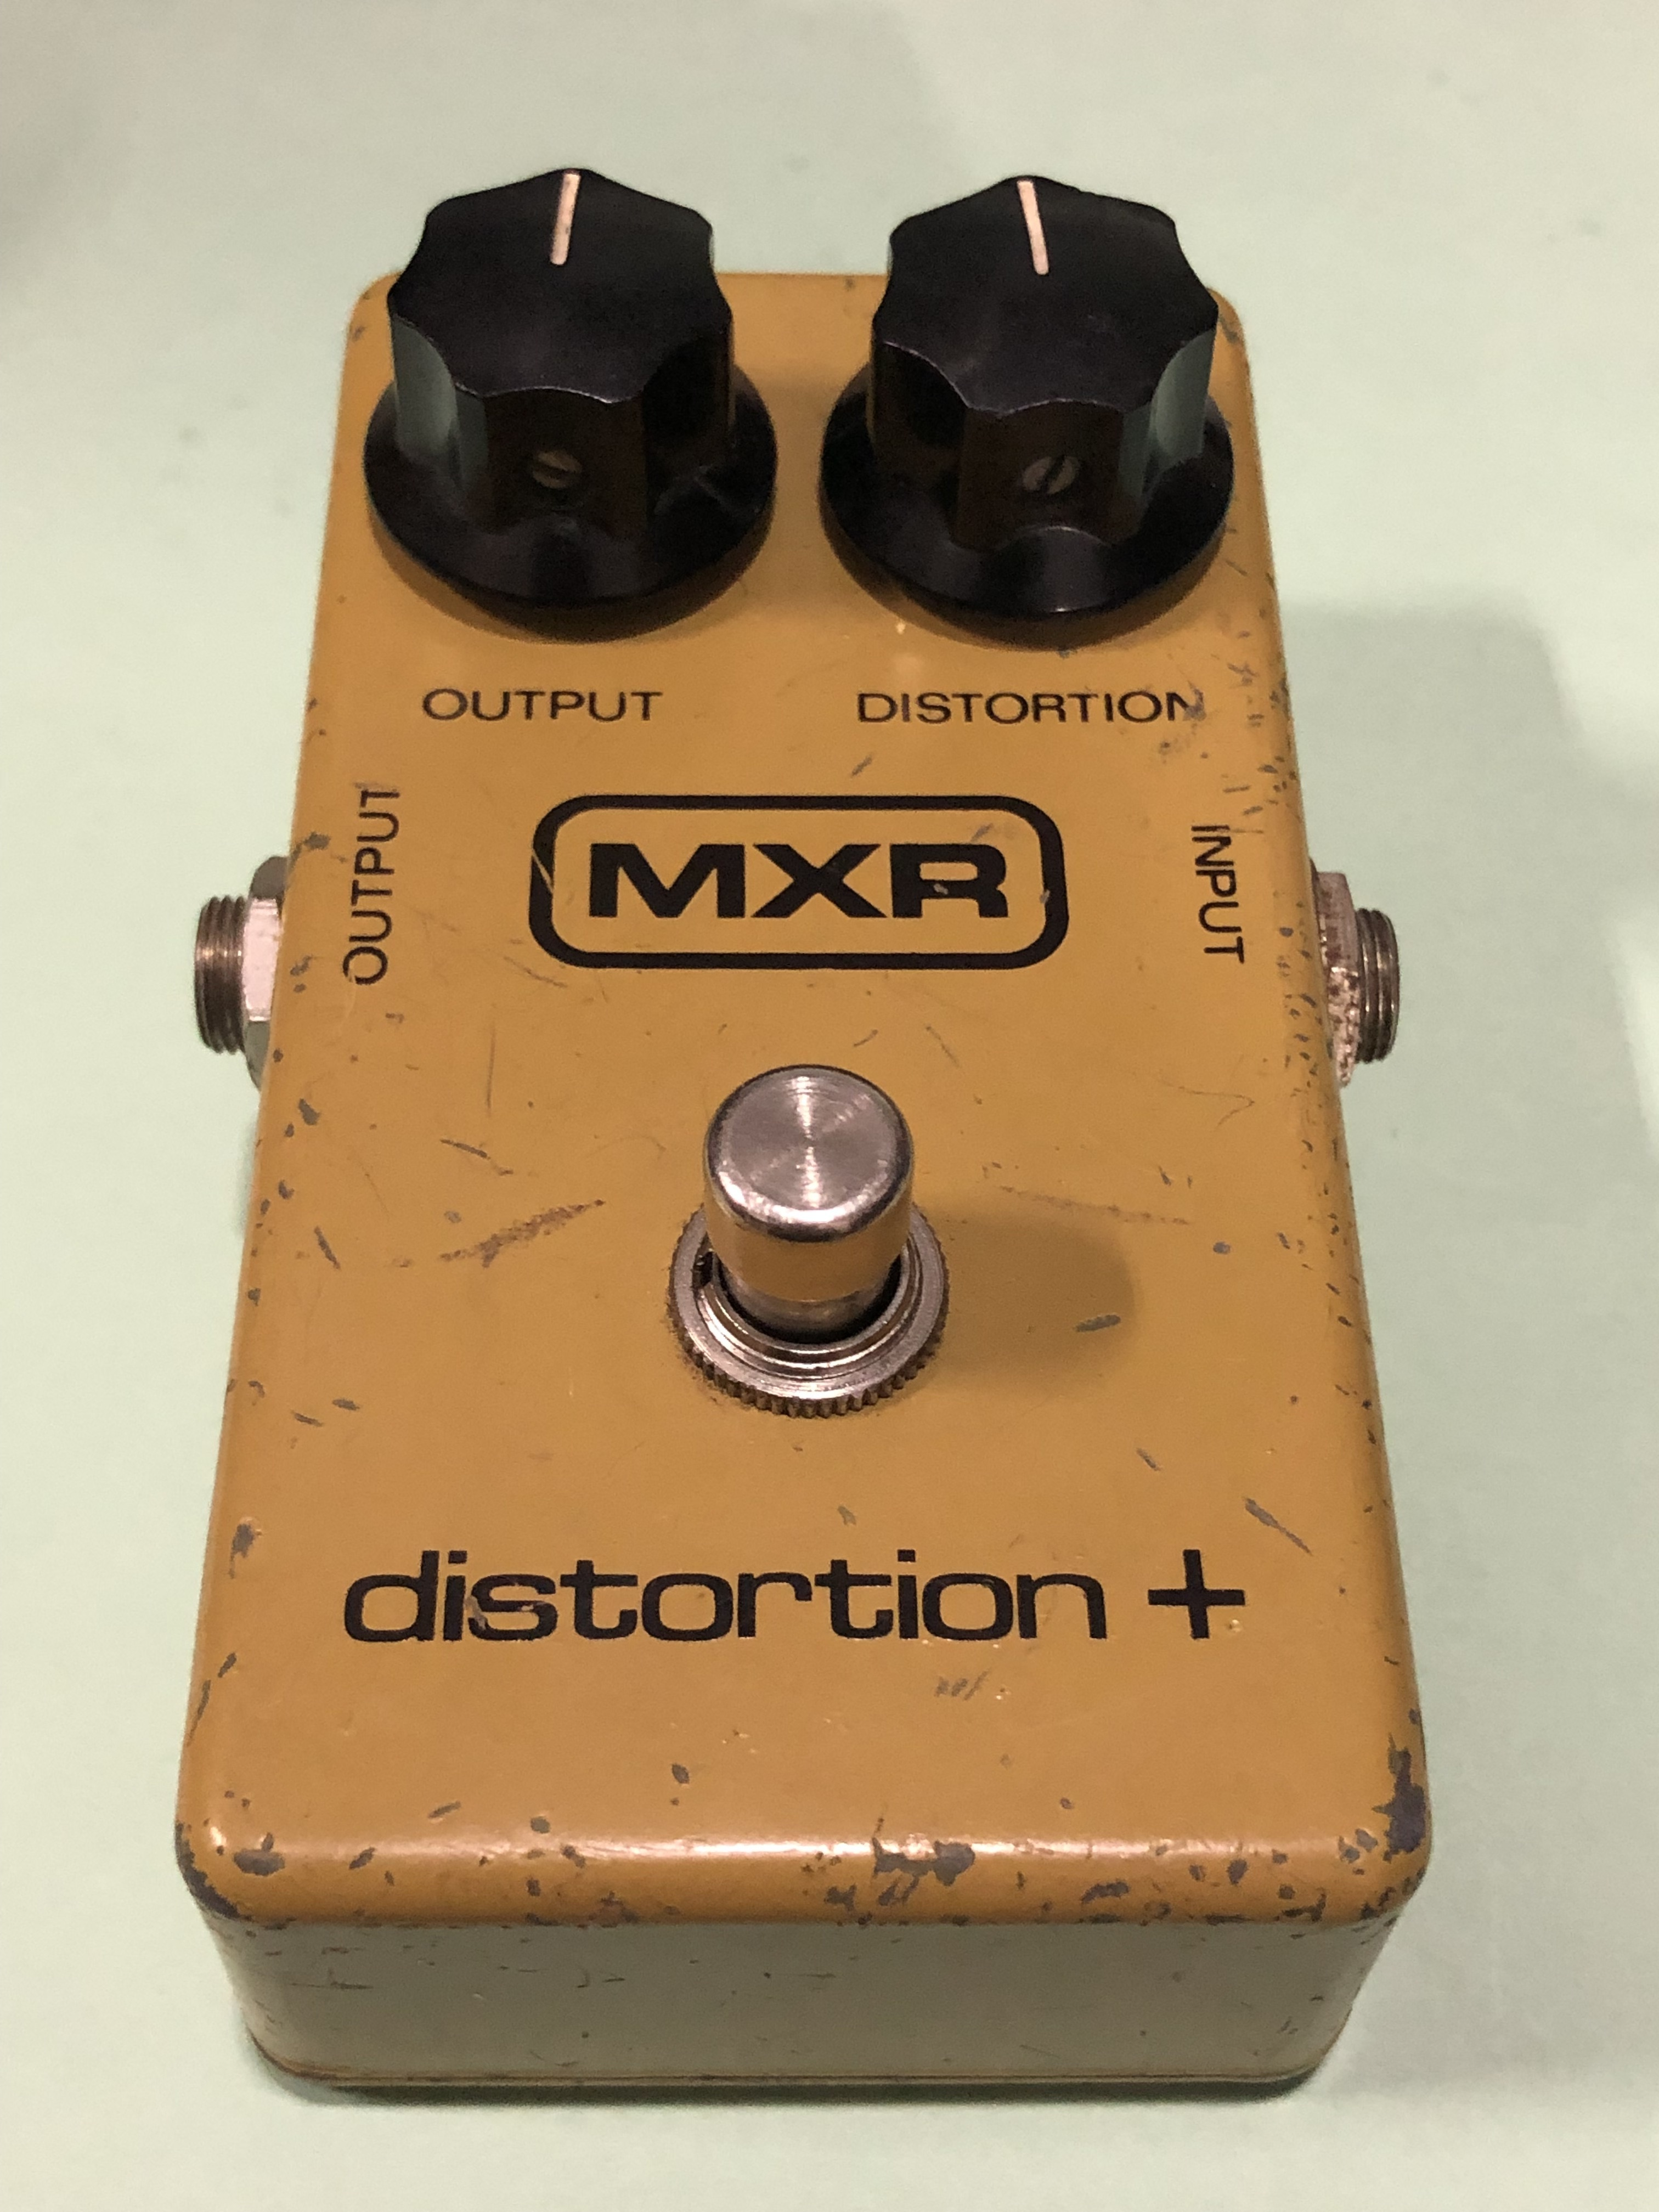 MXR - DISTORTION PLUS - EFFECTS PEDAL